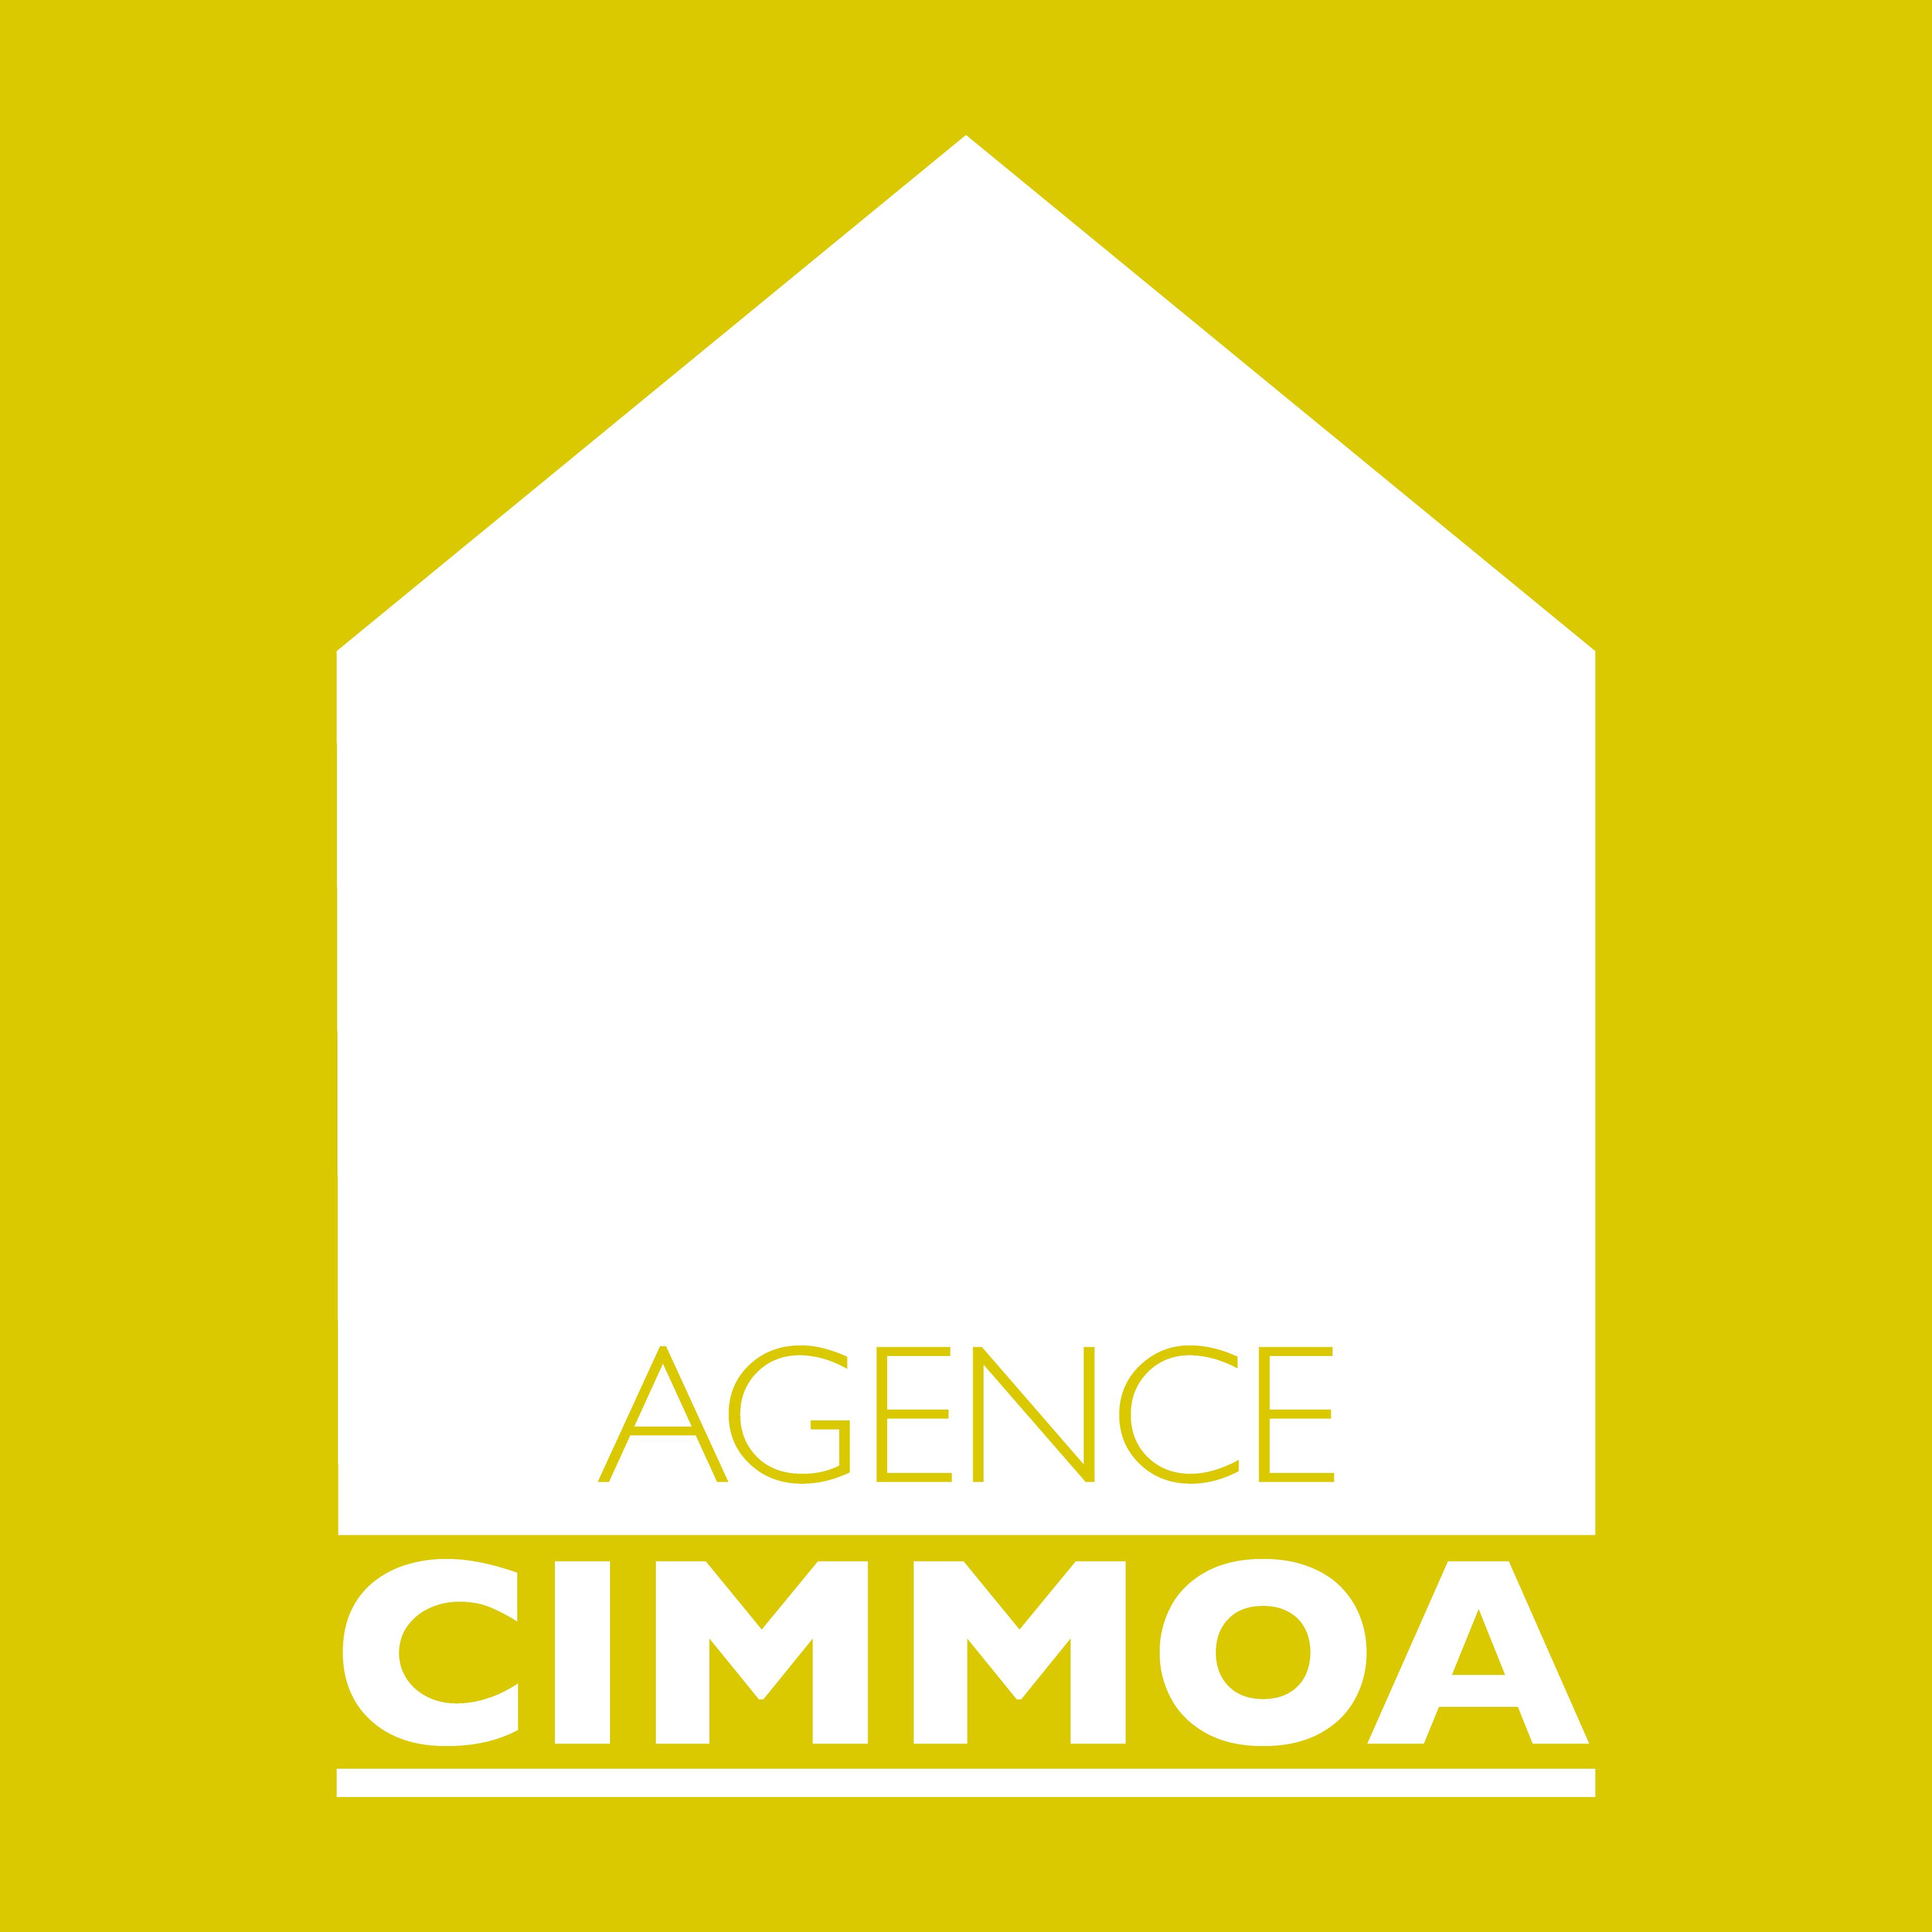 1_cimmoa_1_h